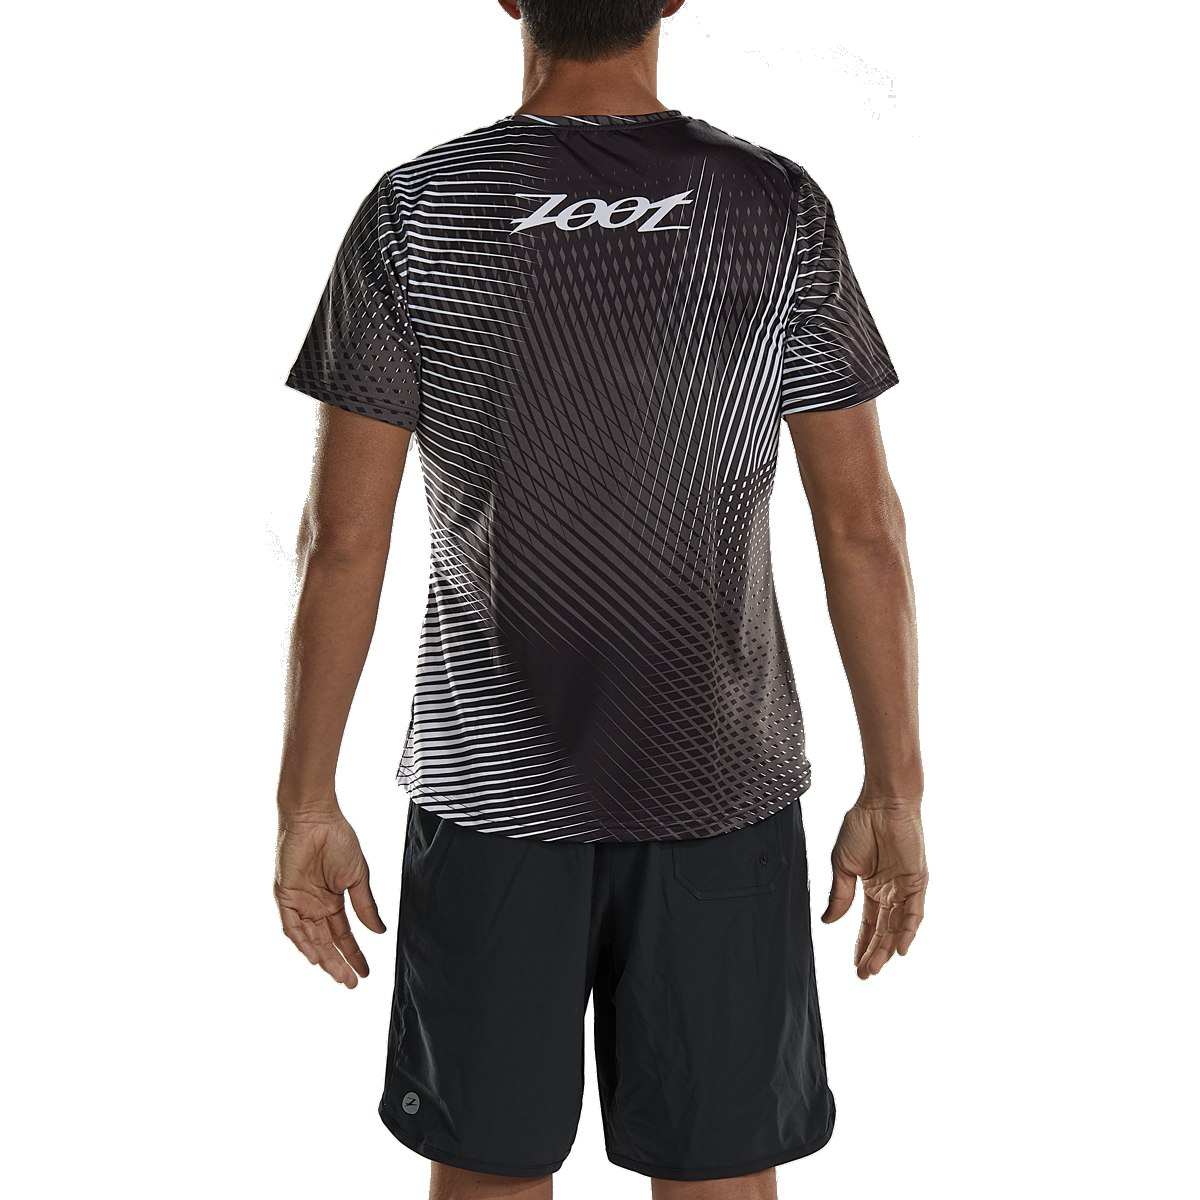 Bild von ZOOT Men's Run LTD Tee Laufshirt - stoke